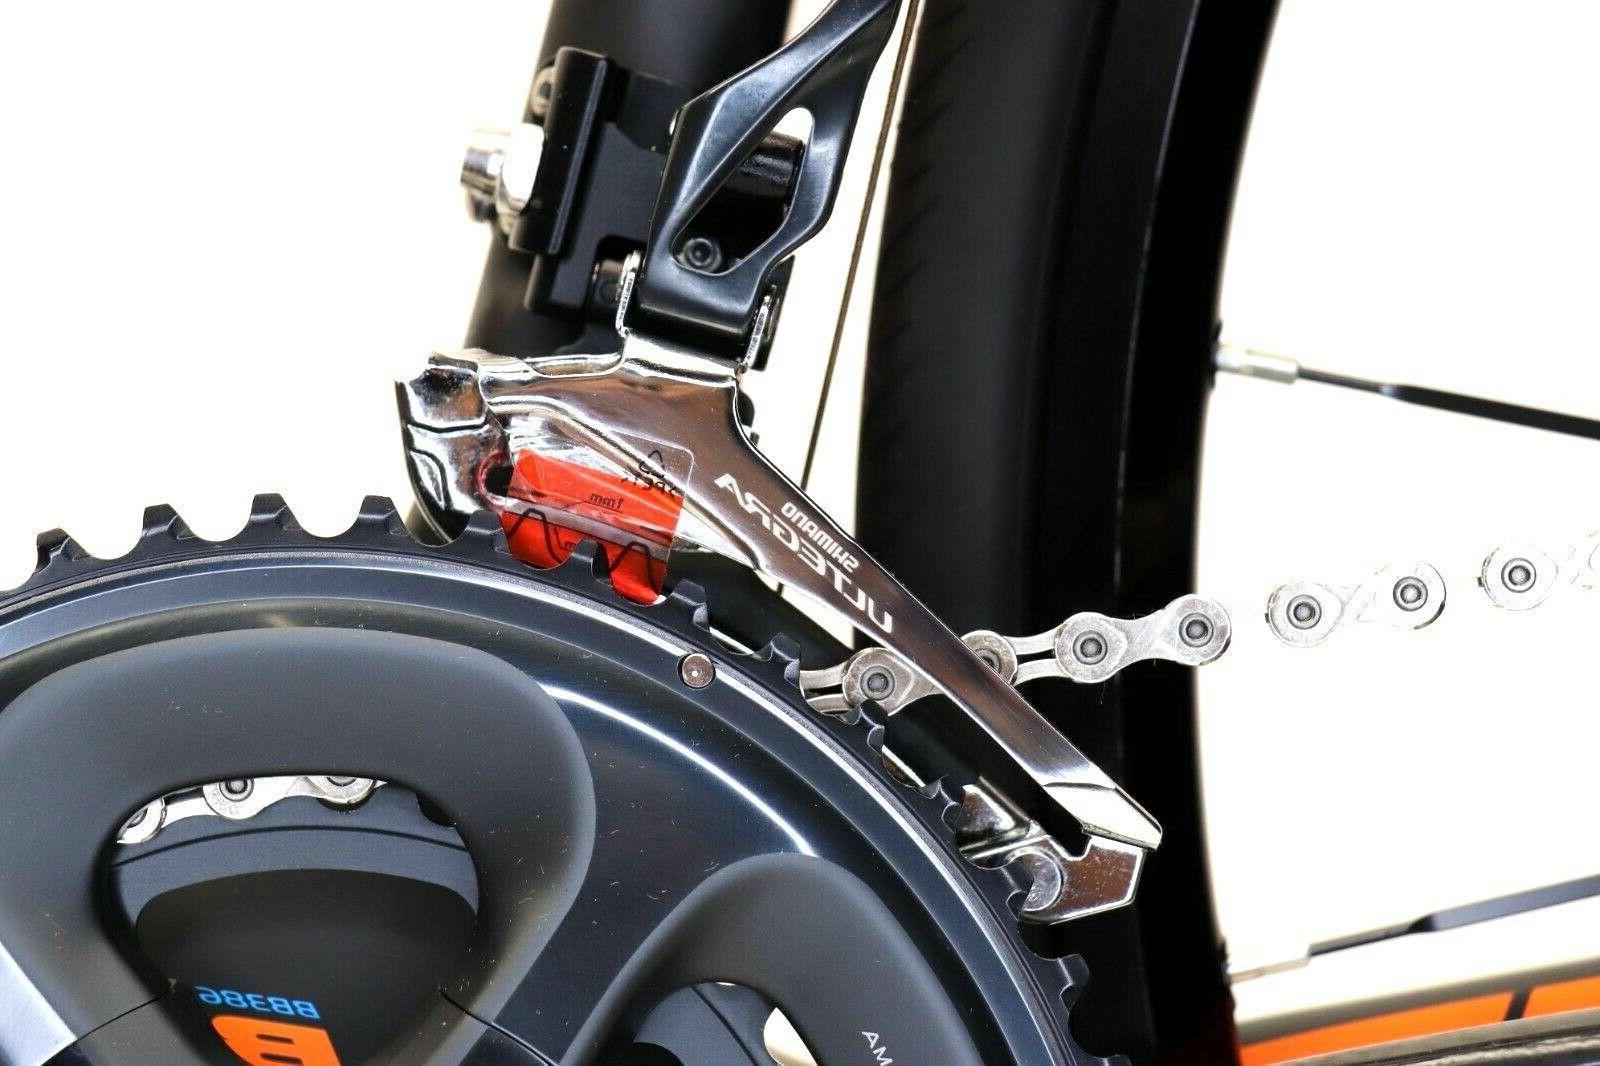 BH Quartz Carbon Road Bike Brakes Ultegra / cm Black